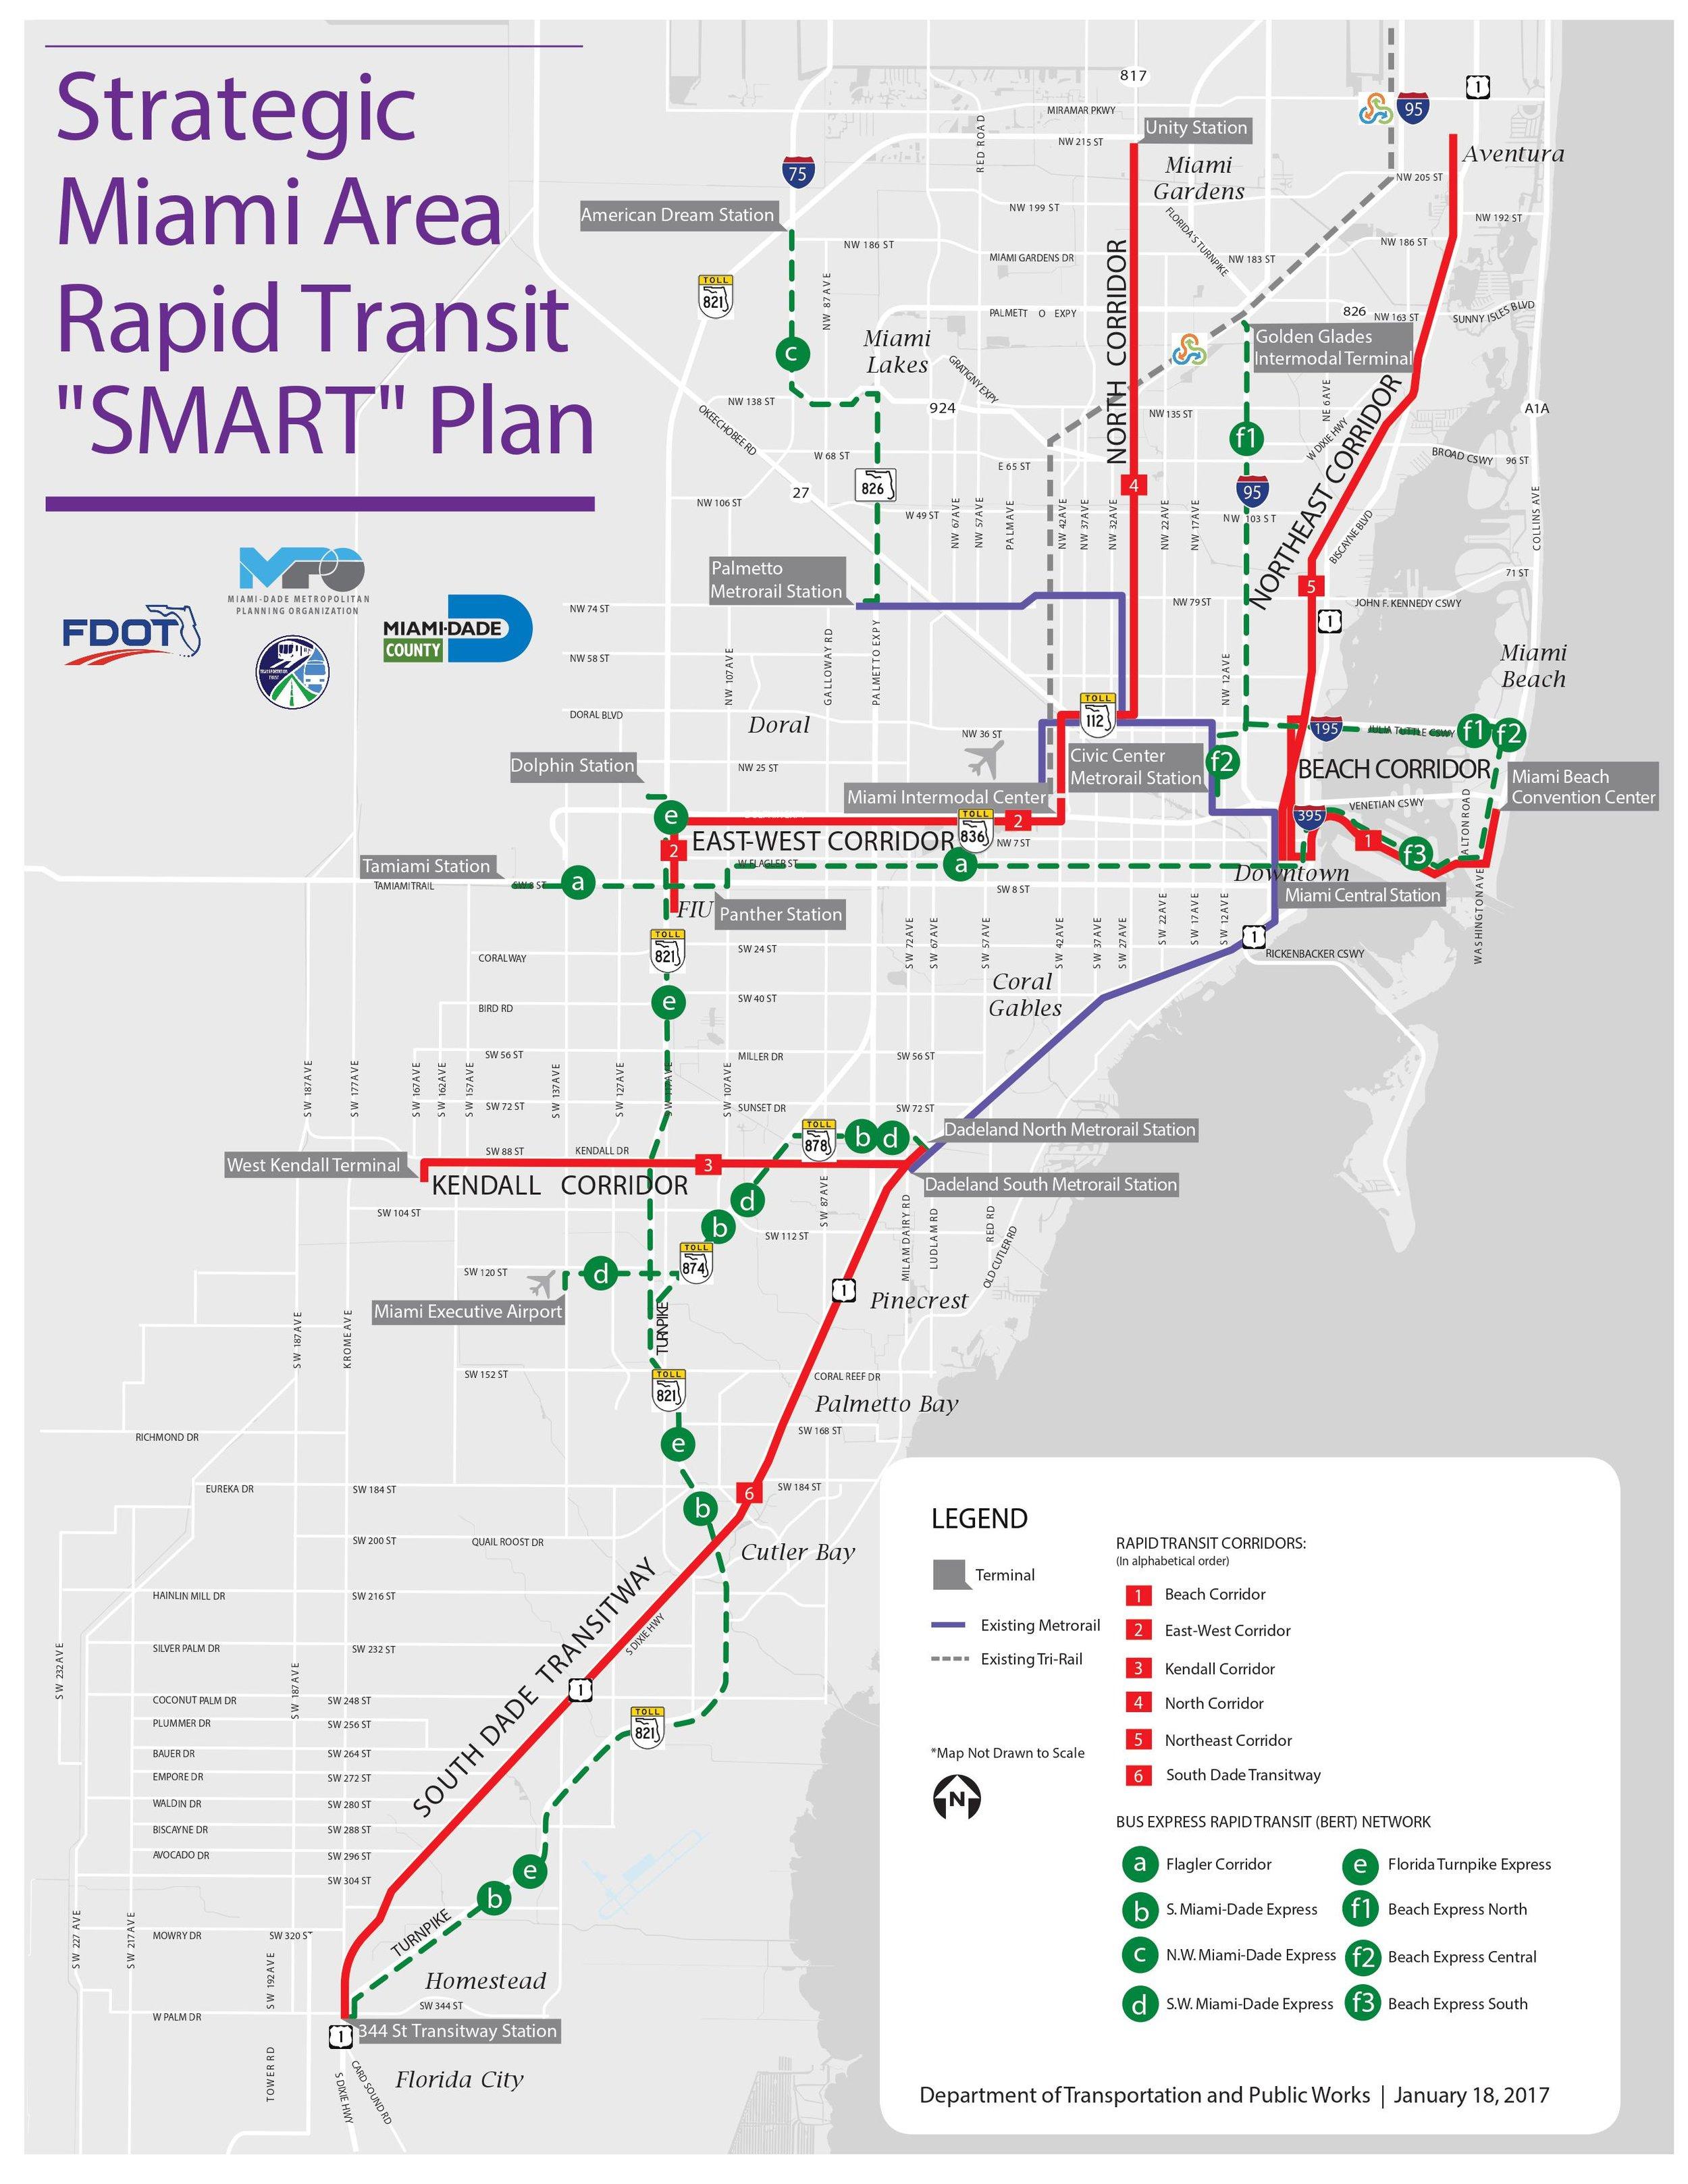 Rapid Transit SMART Plan Expansion Miami Public Transportation